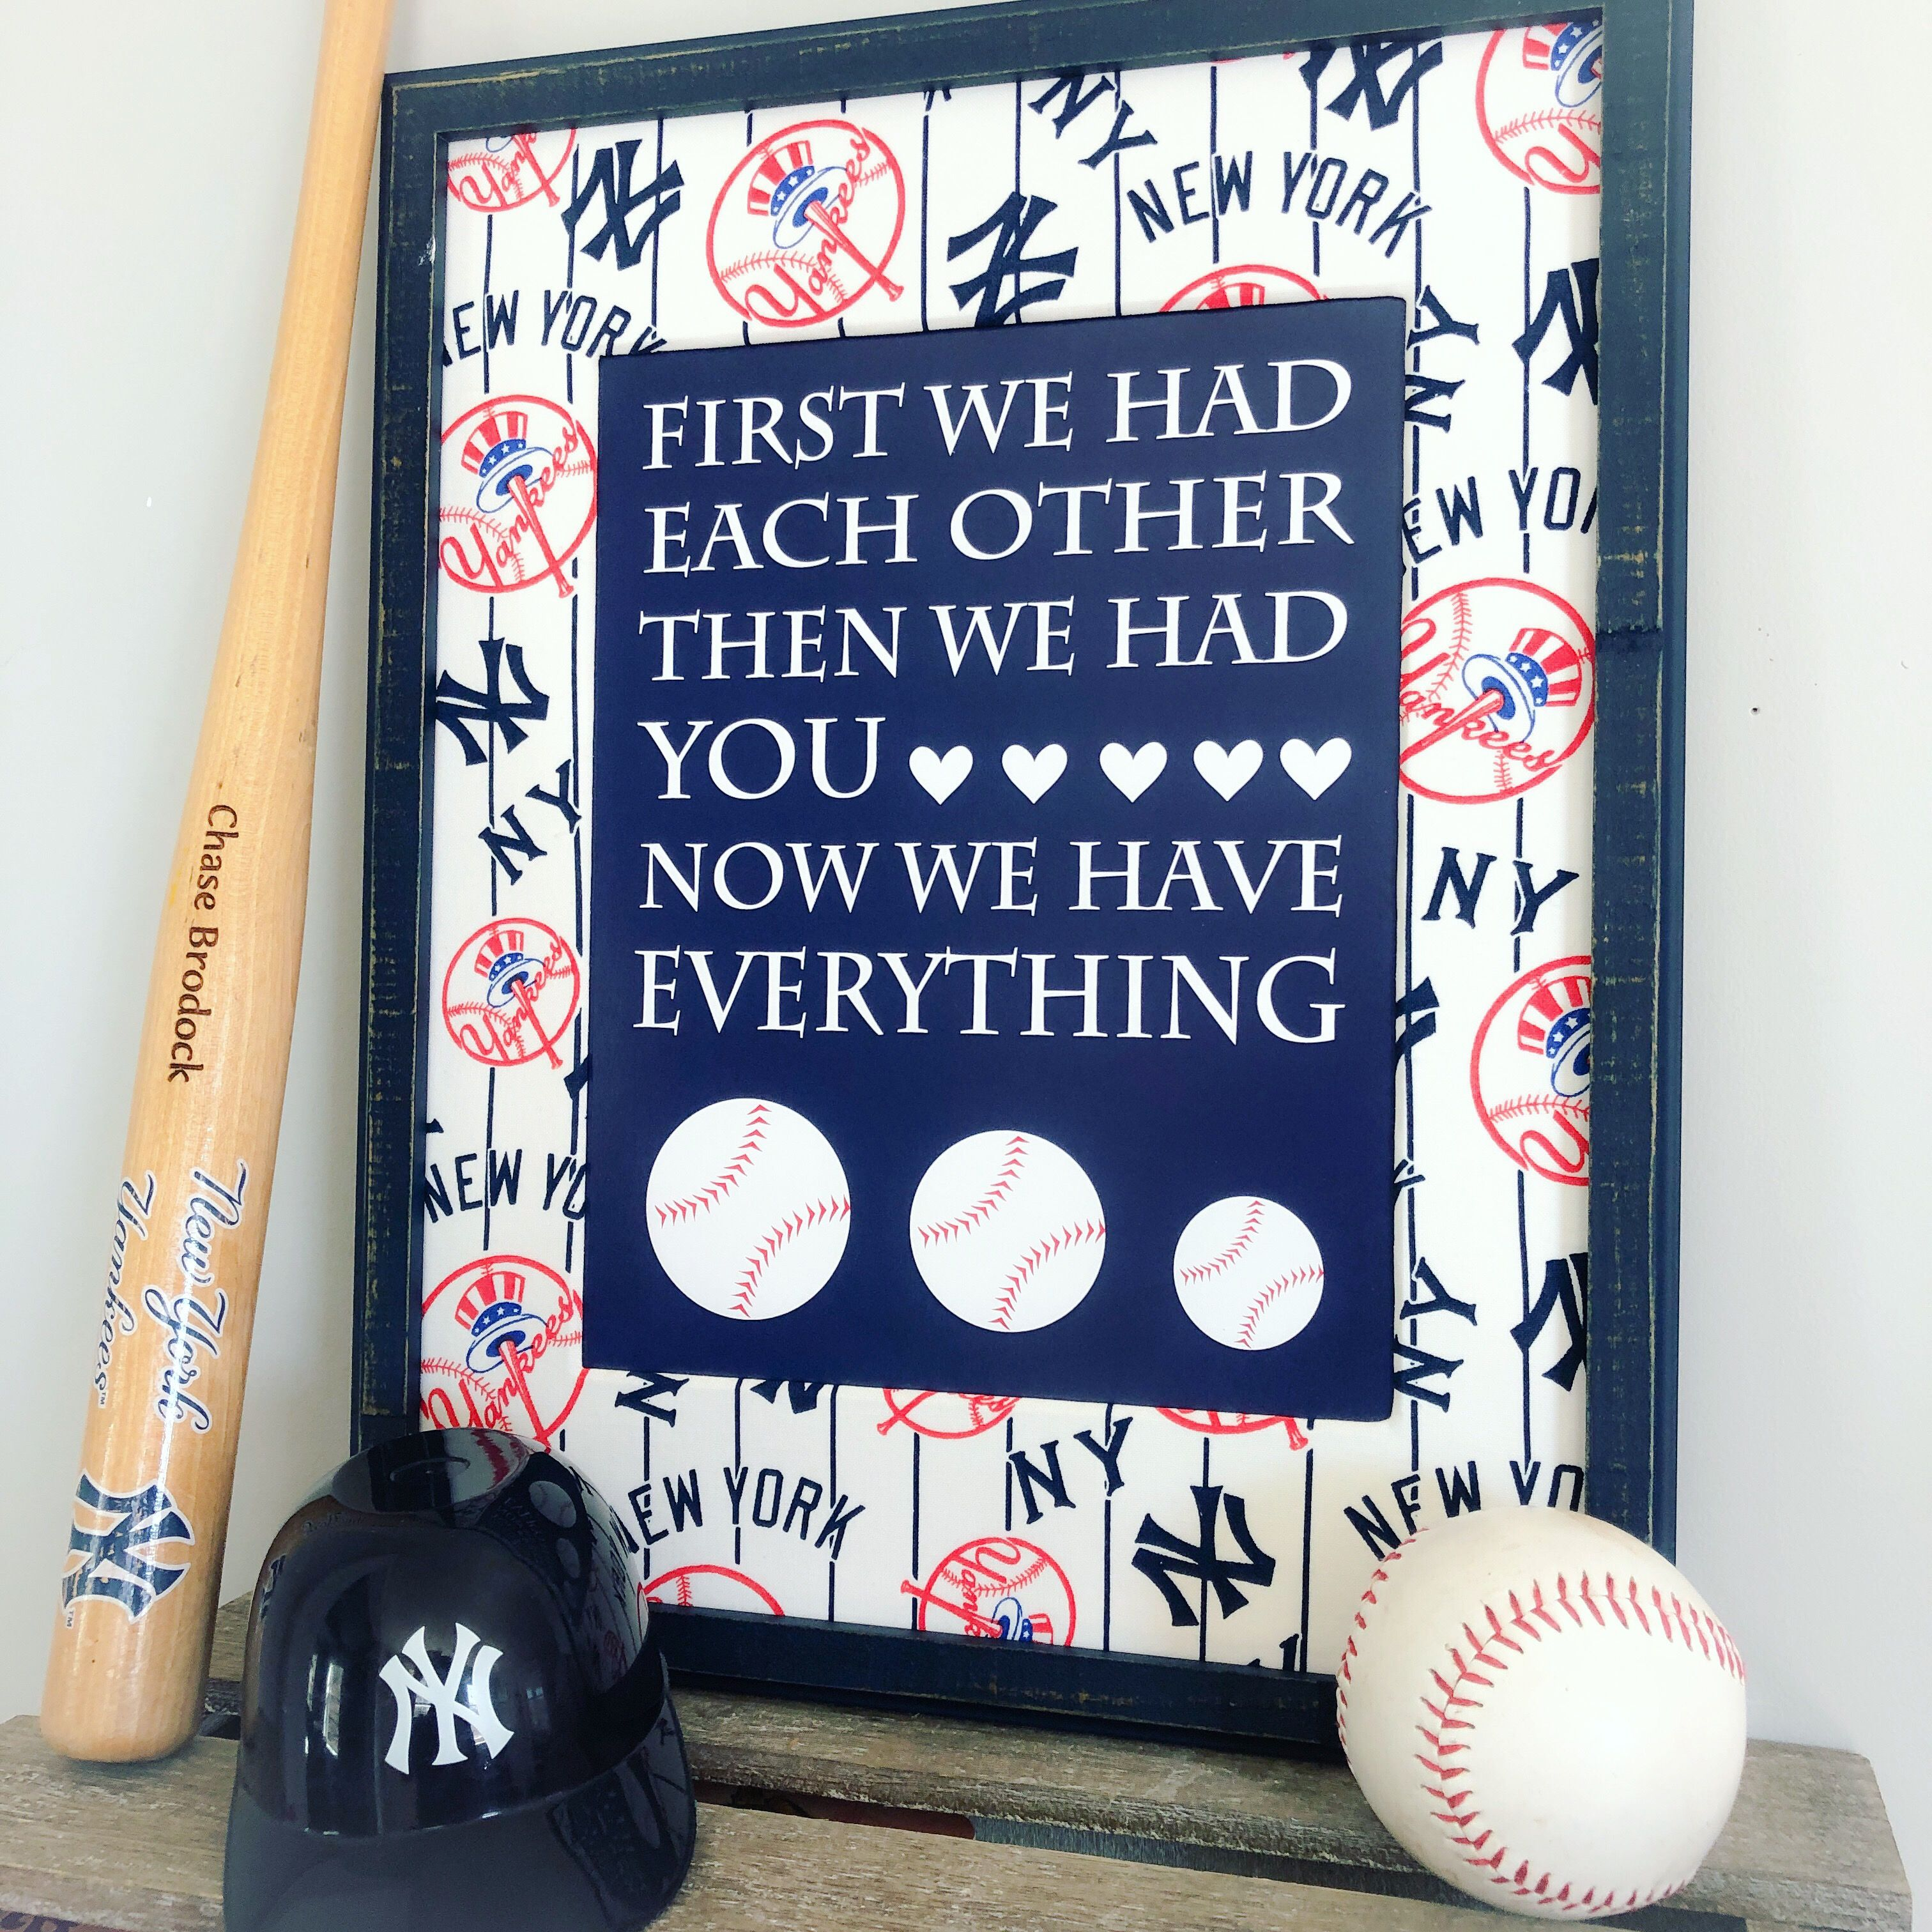 Baby Boy Baseball Nursery Ideas New York Yankees Nursery Decor Sports Nursery New York Yankees Bedroo With Images Baseball Nursery Baseball Nursery Decor Sports Nursery